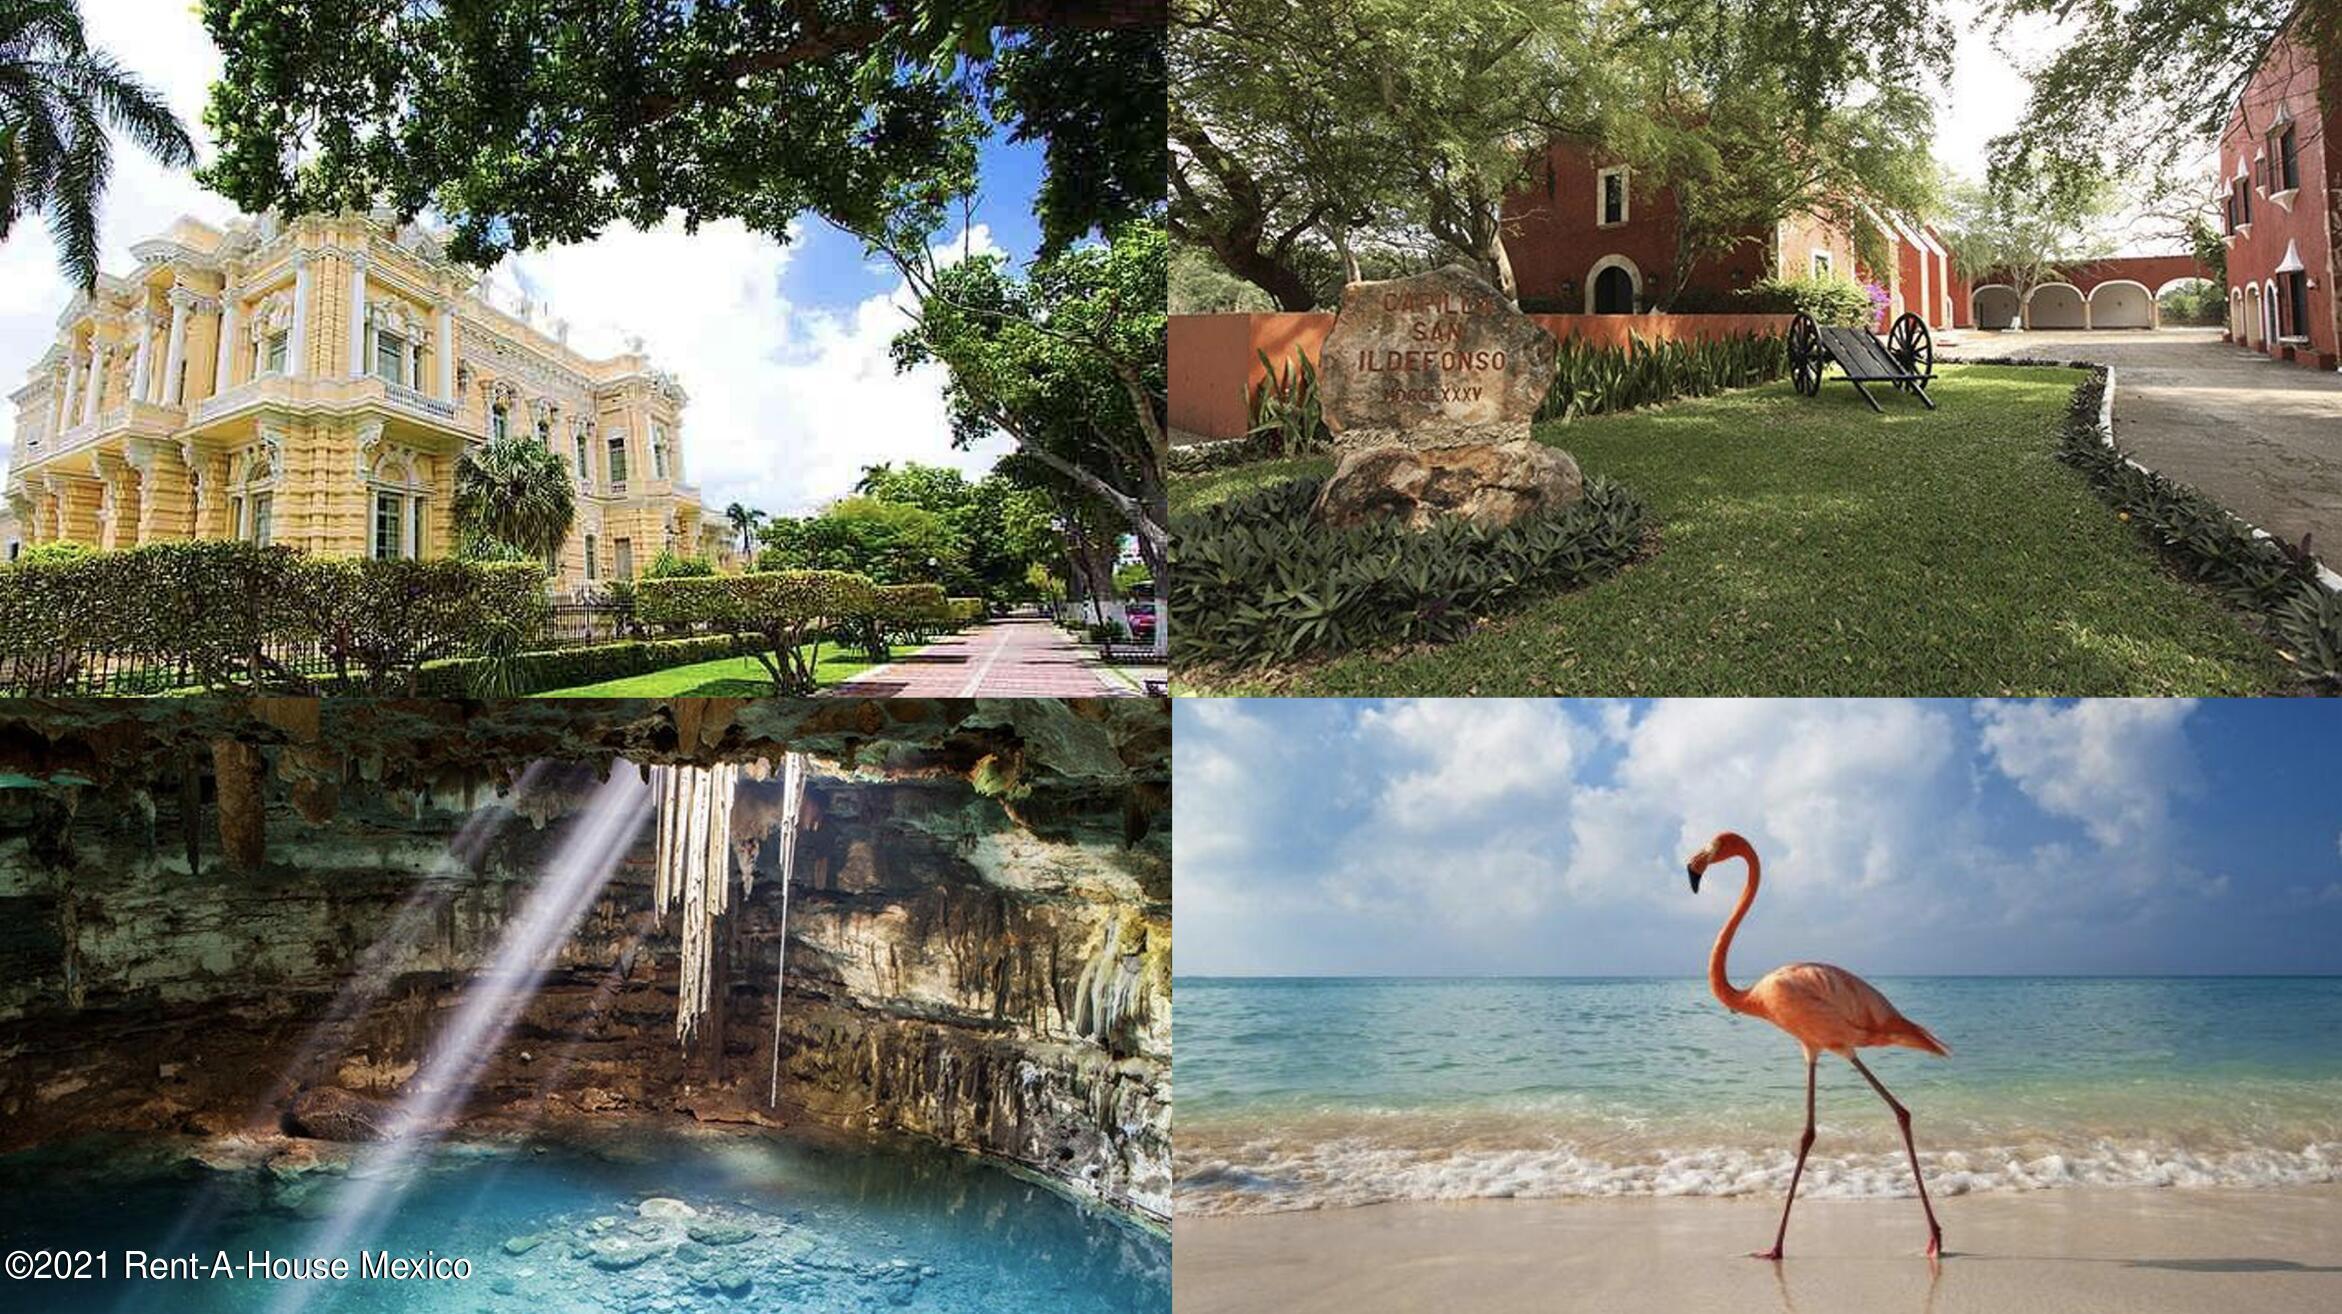 Terreno Yucatan>Merida>Puerto Progreso - Venta:546.238 Pesos - codigo: 21-3912